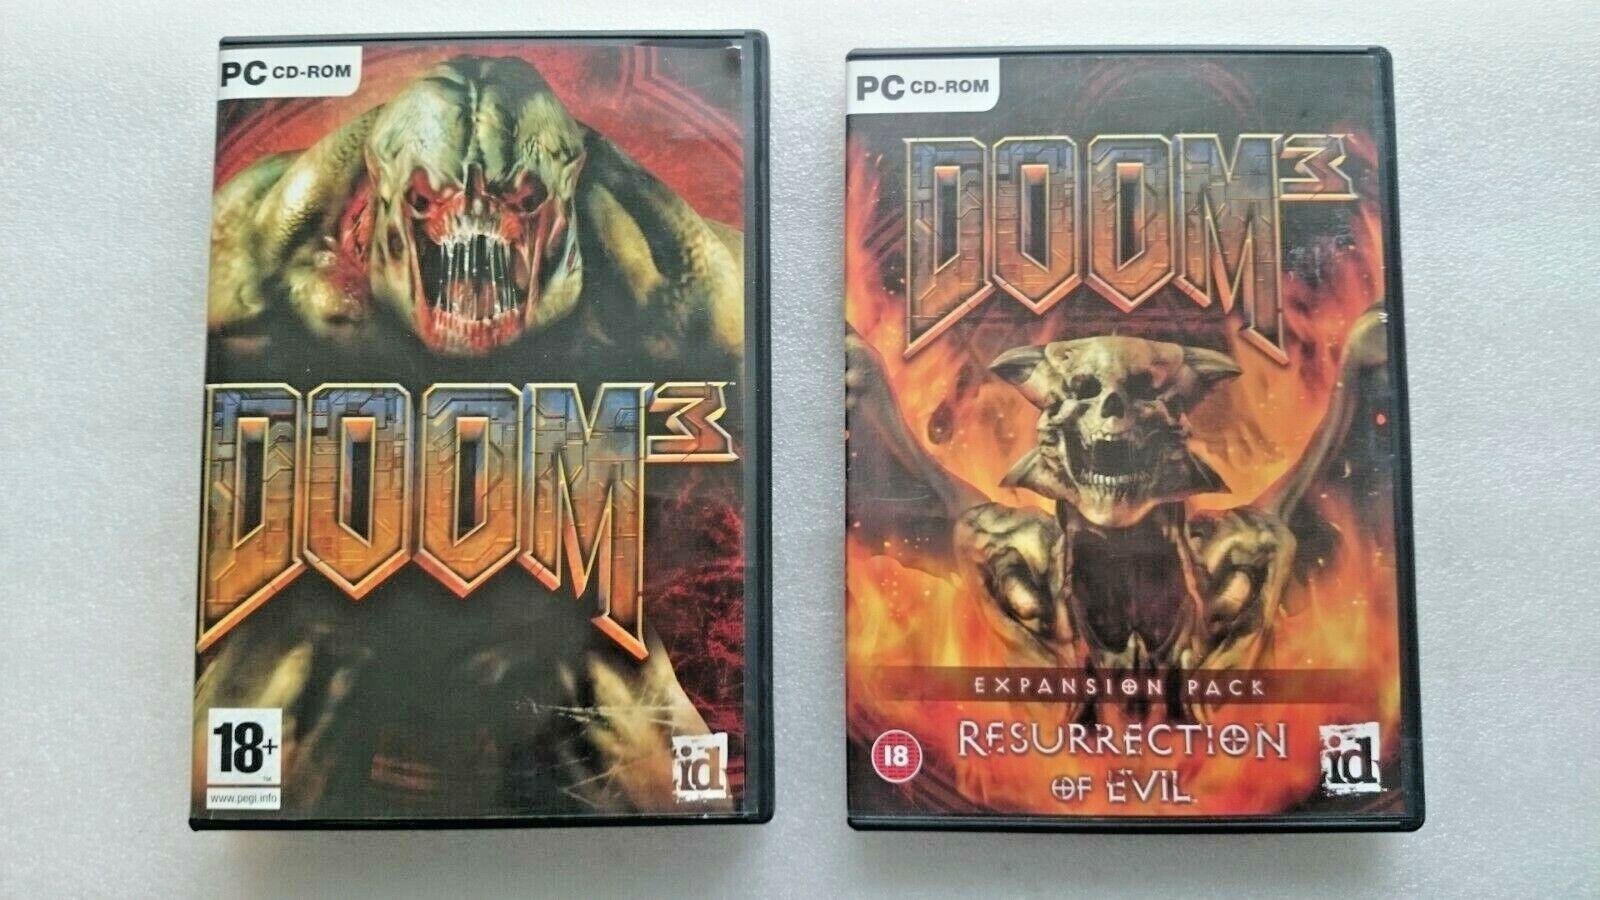 Doom 3 Plus Resurerection Of Evil Expansion Pack (PC: Windows, 2004)